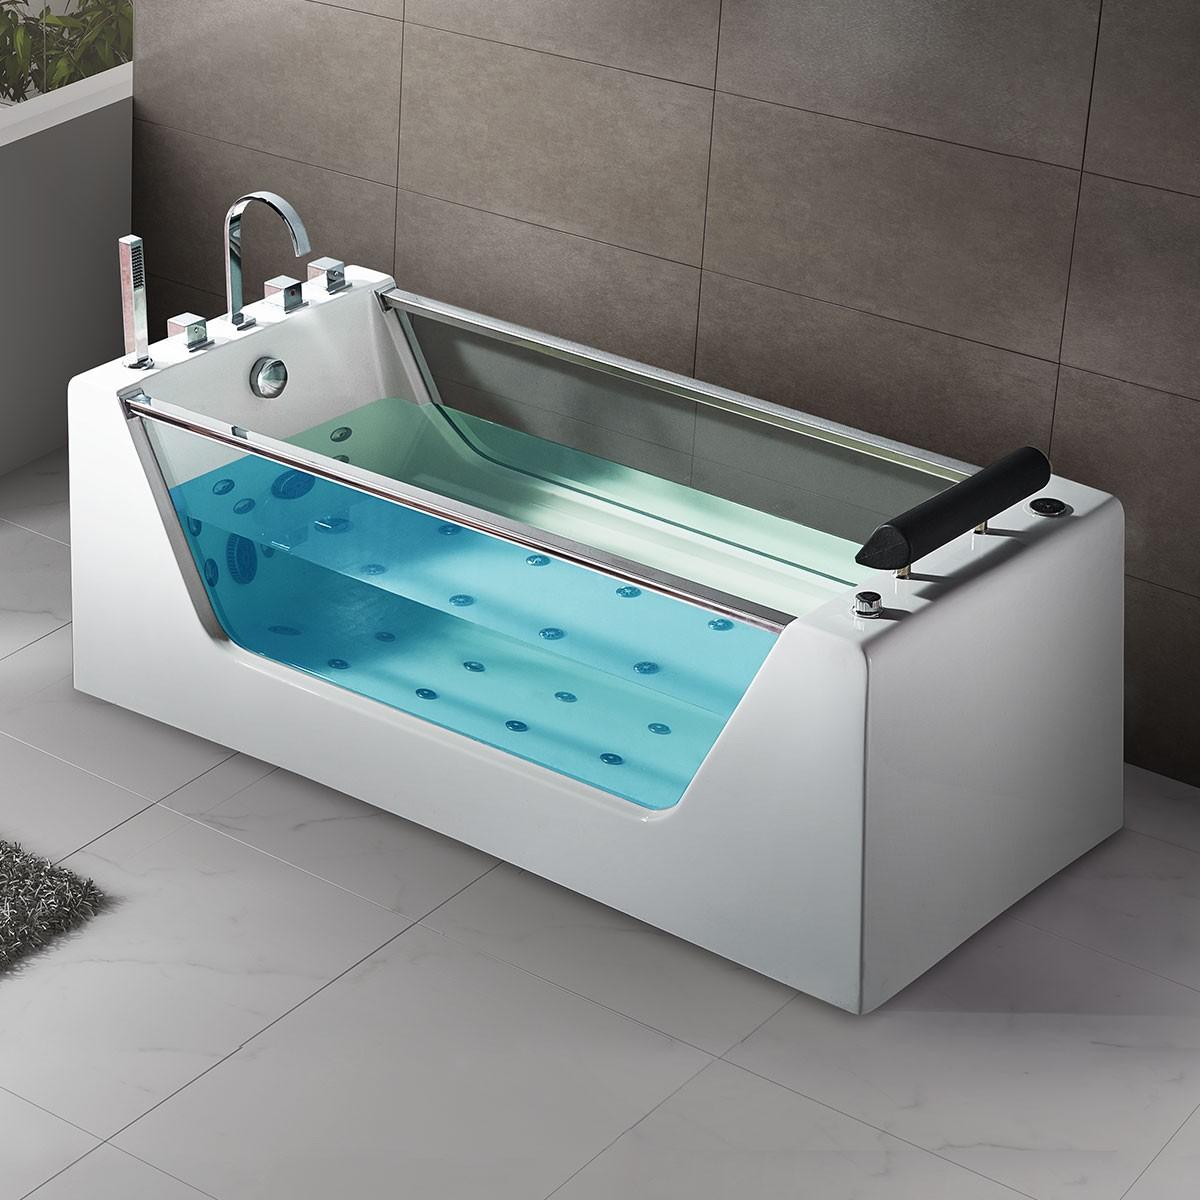 67 In Whirlpool Tub - Acrylic White (DK-Q412)   Decoraport Canada